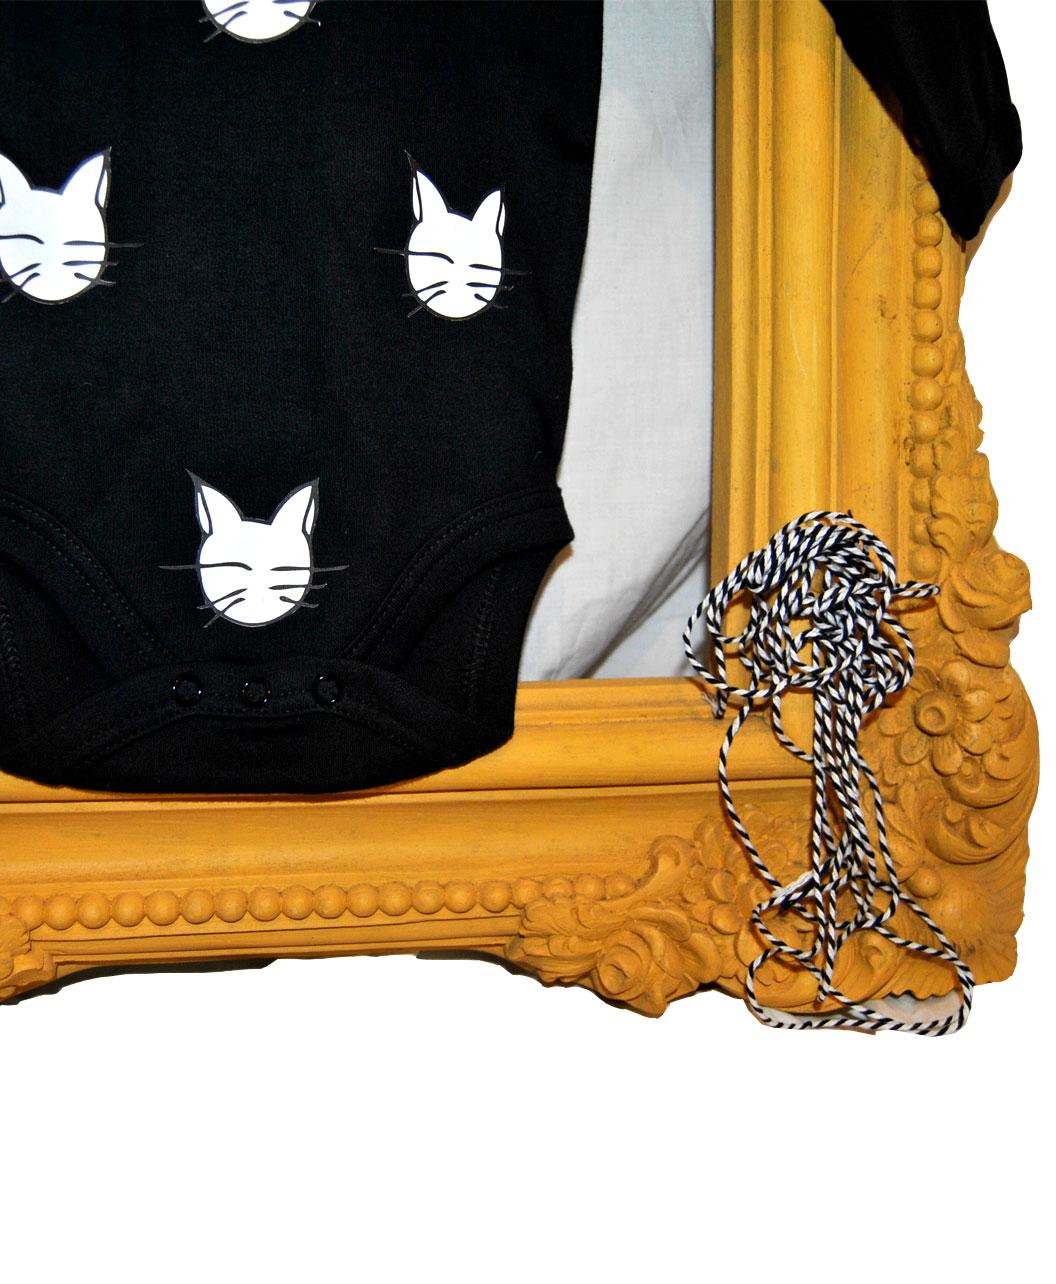 bodie algodon organico negro manga larga original y diferente gatos